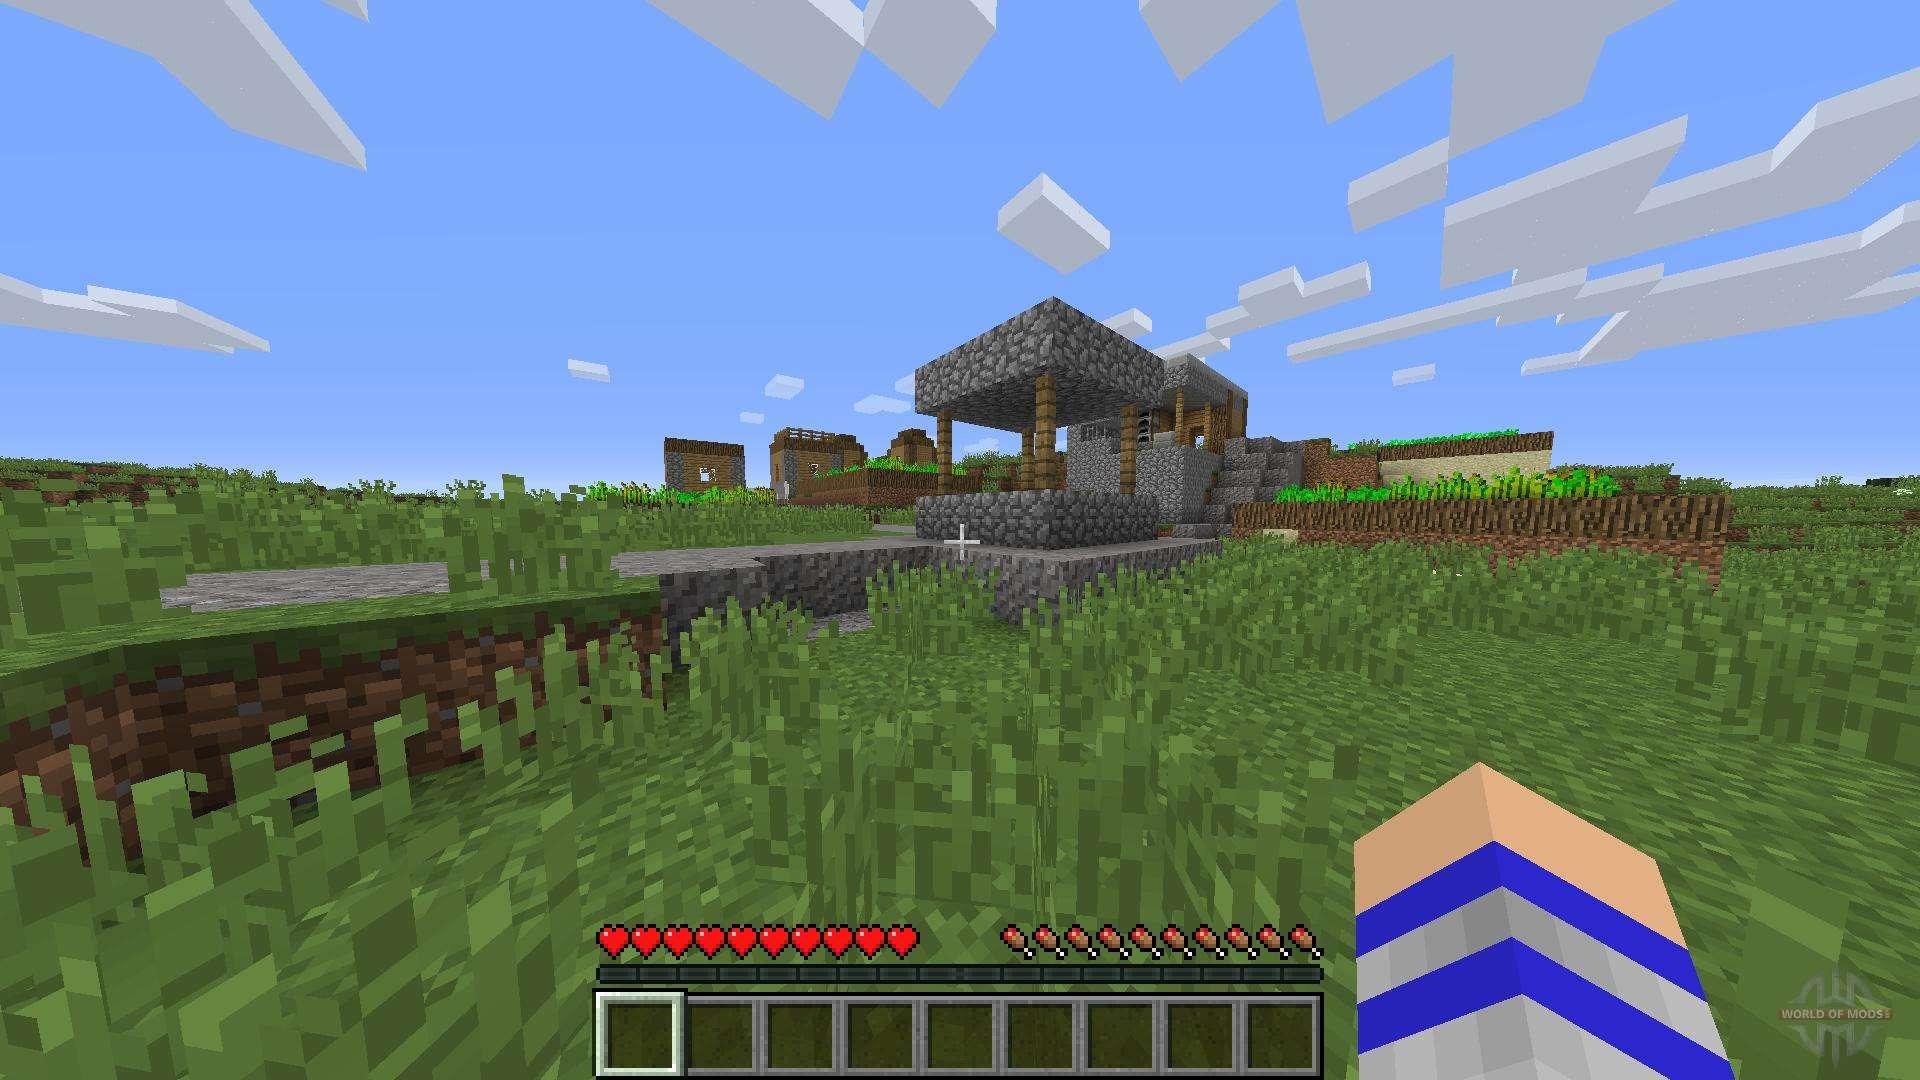 Tale of Kingdoms Mod para Minecraft 1.5.1 y 1.5.2